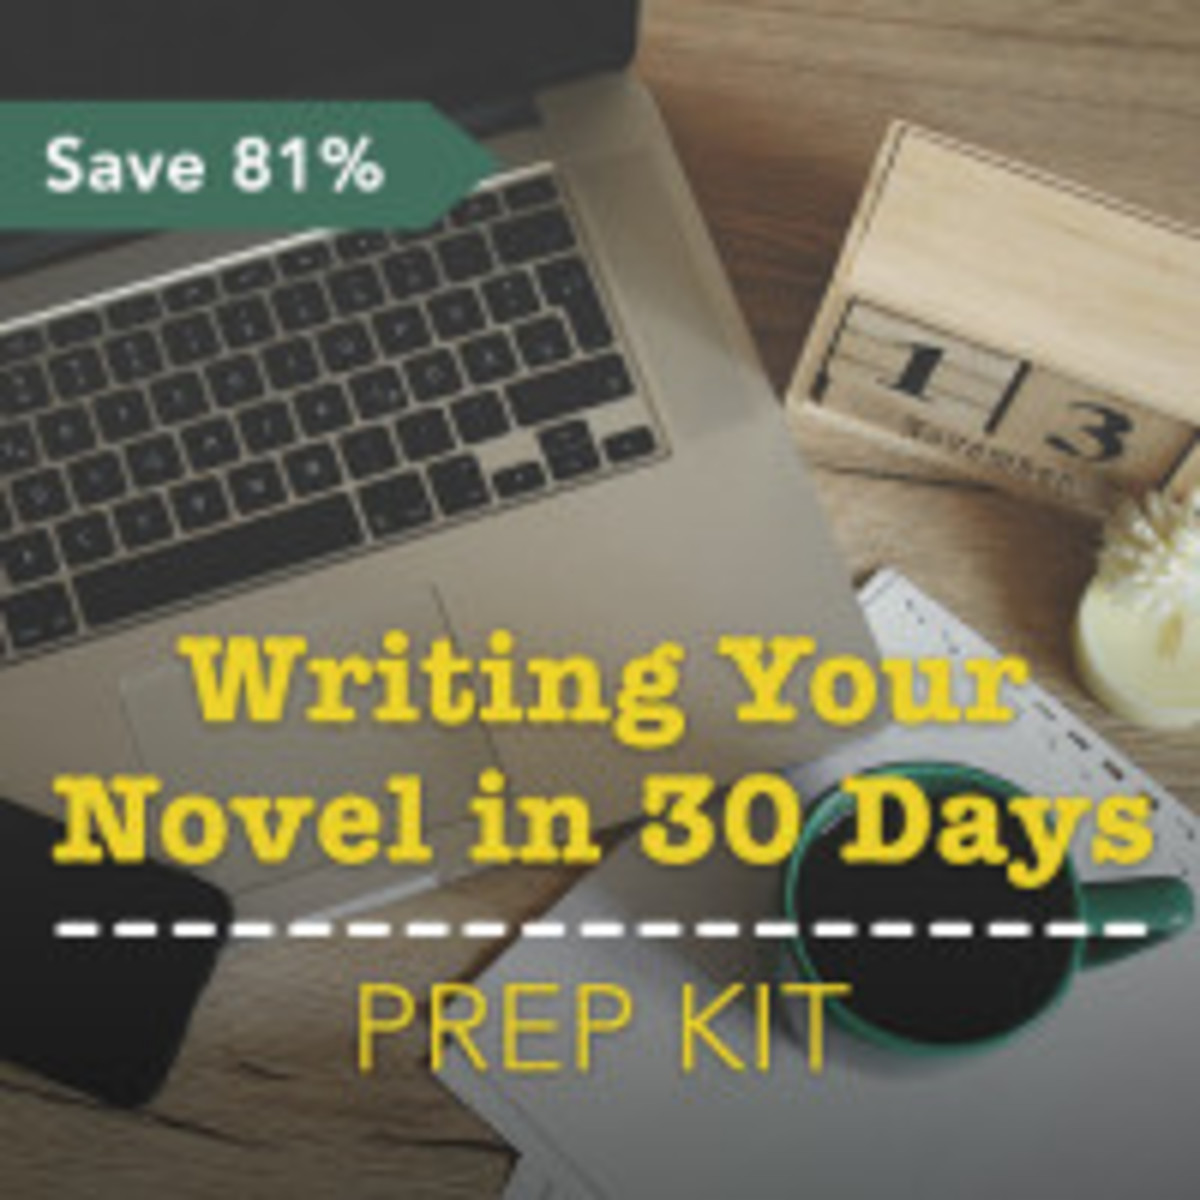 Writing Your Novel in 30 Days: Prep Kit